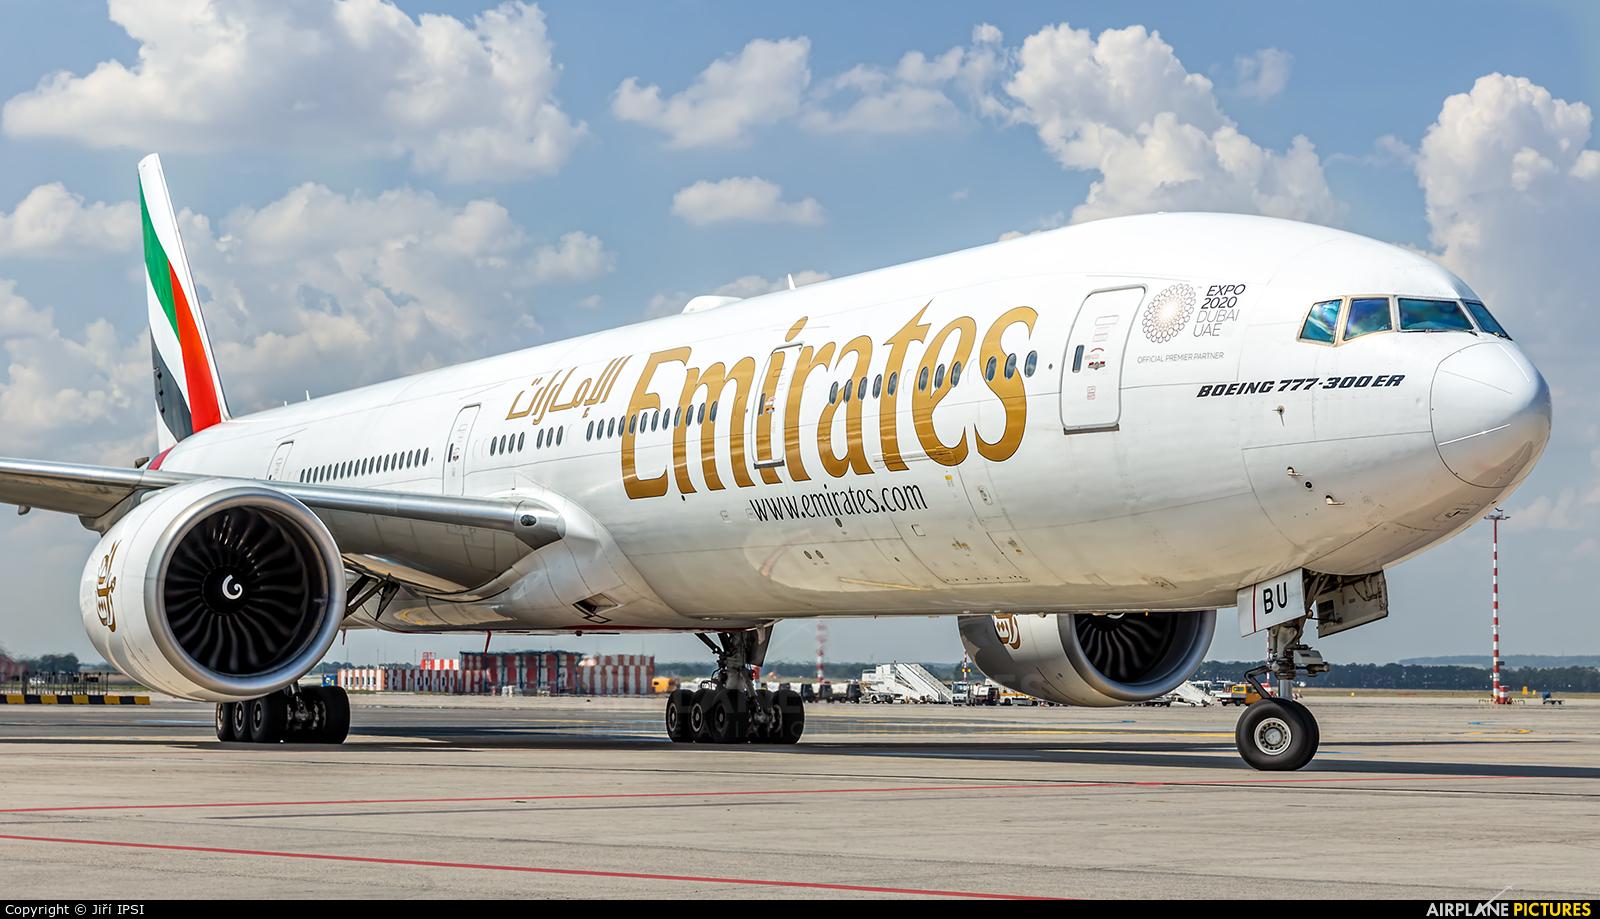 Emirates Airlines A6-EBU aircraft at Prague - Václav Havel